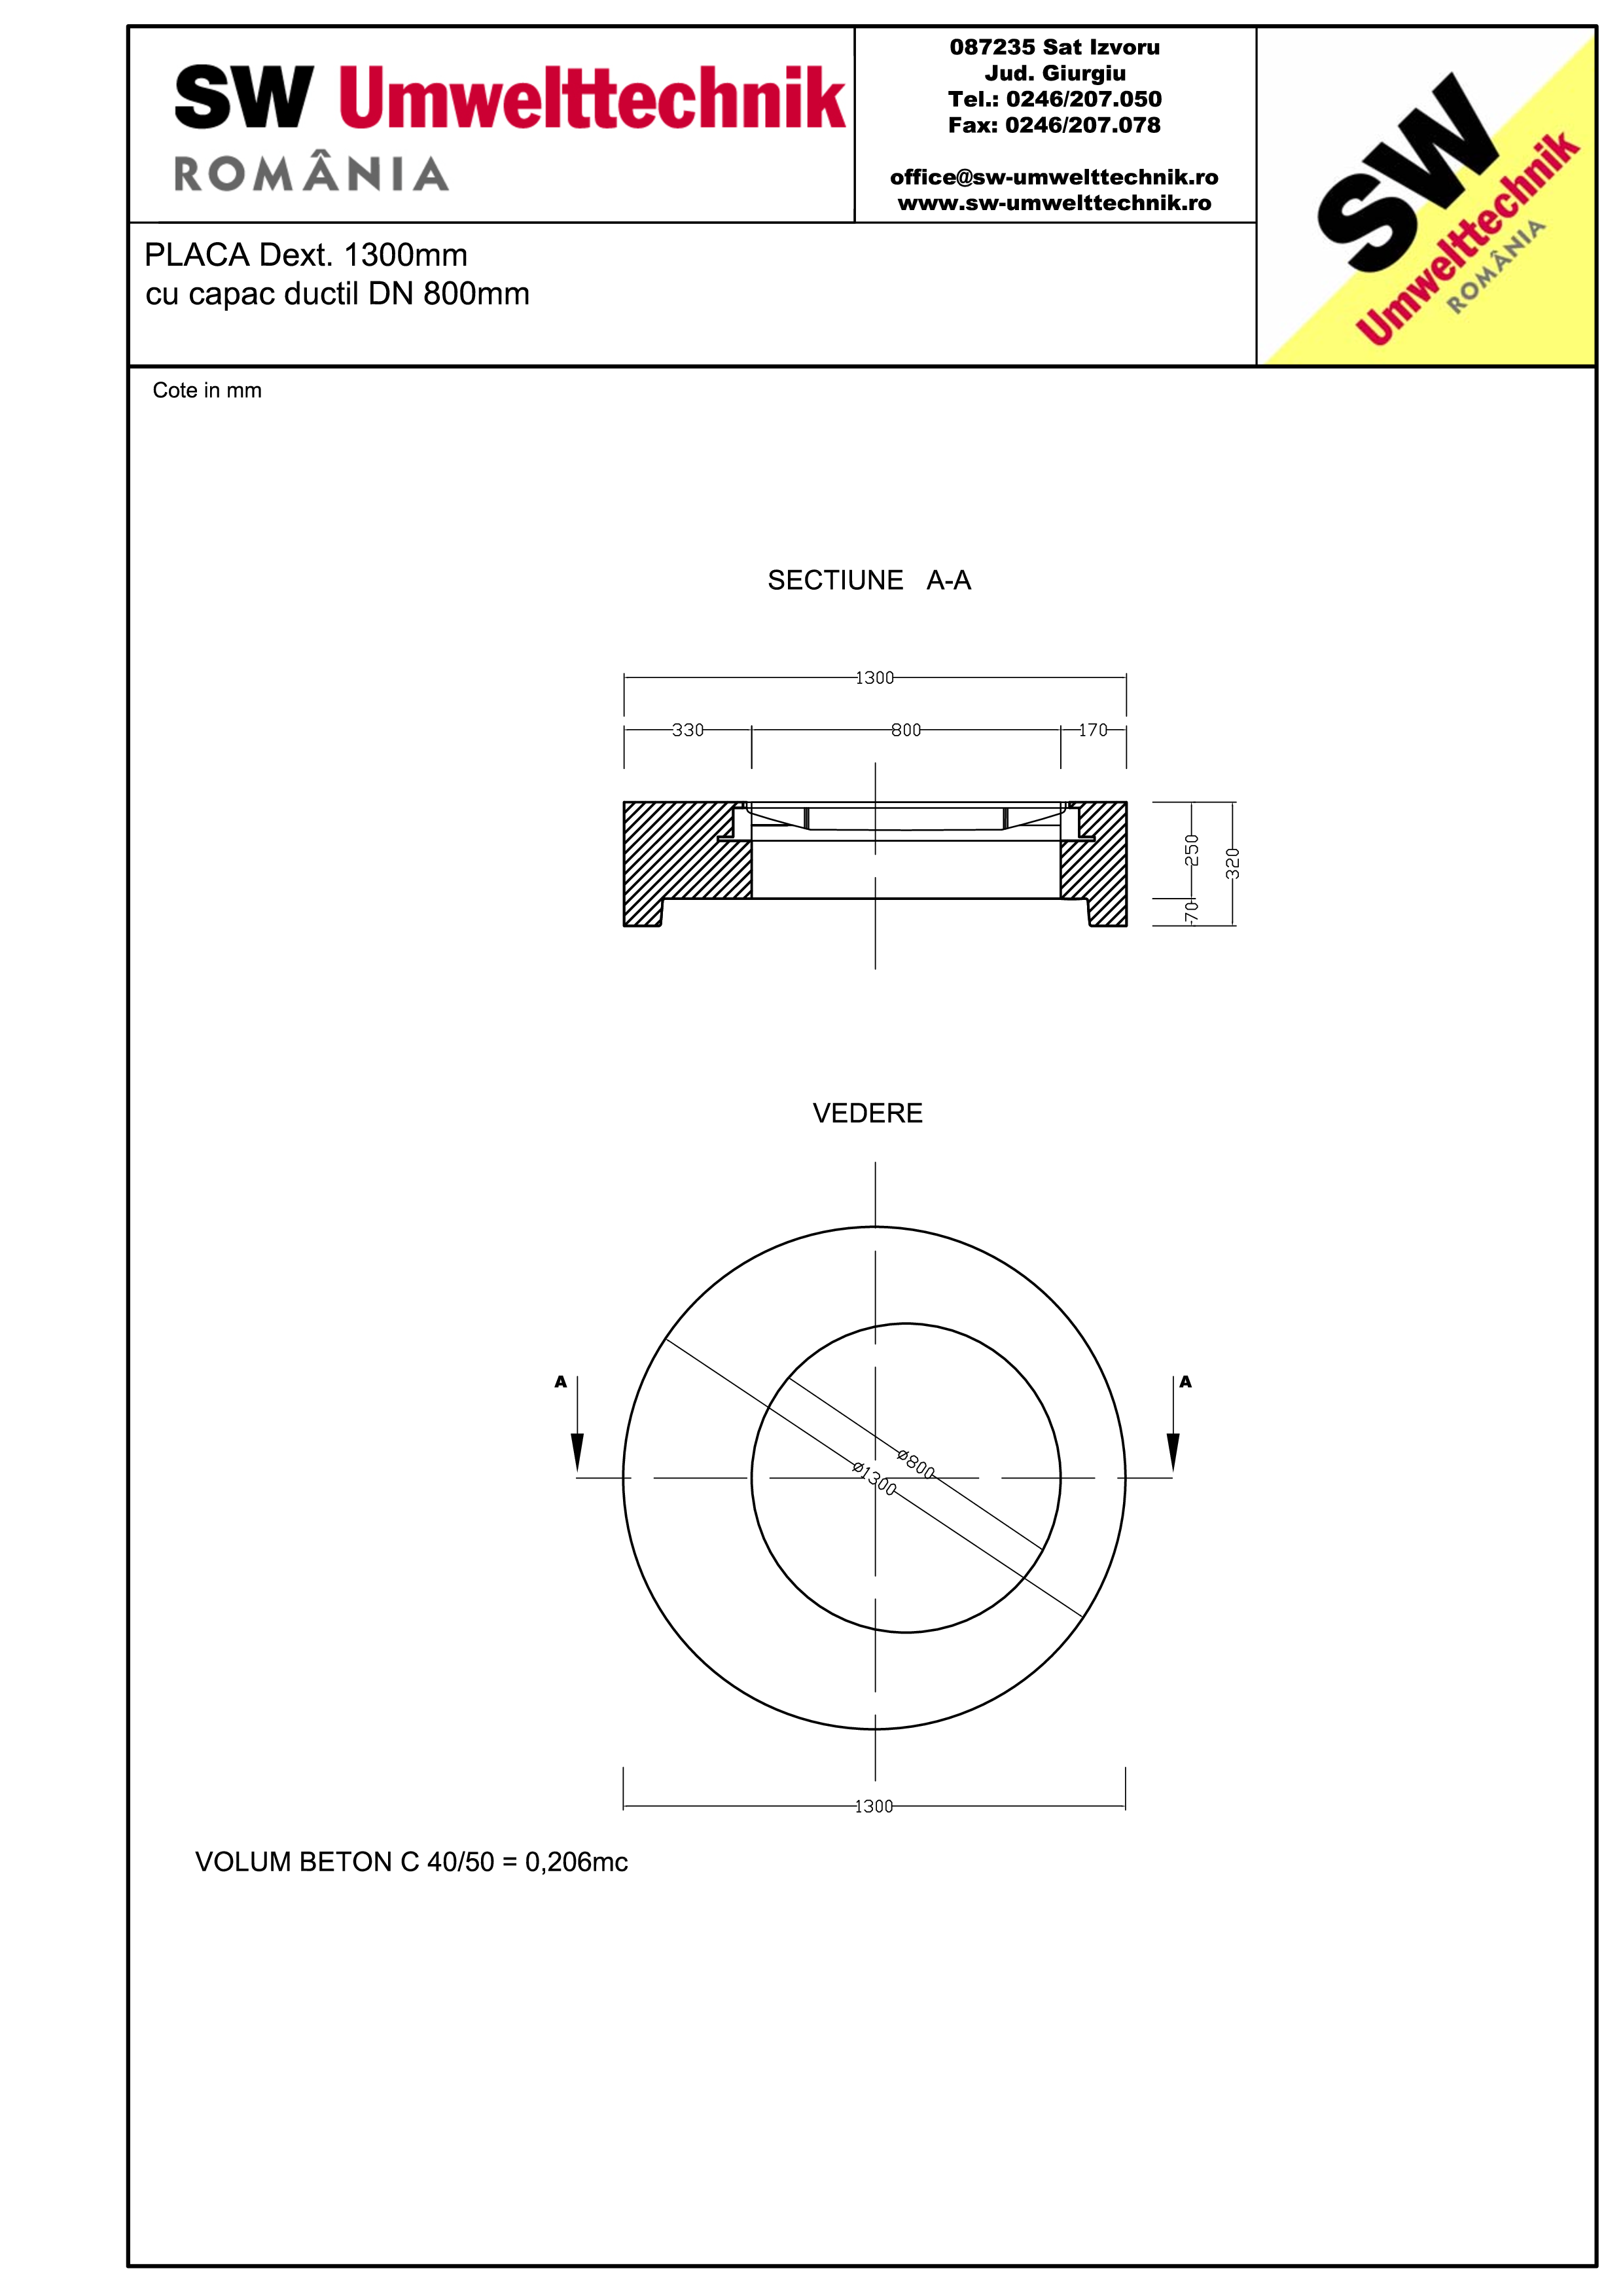 Pagina 1 - CAD-PDF Placa Dext.1300 H250 cu capac ductil DN800 SW UMWELTTECHNIK Detaliu de produs